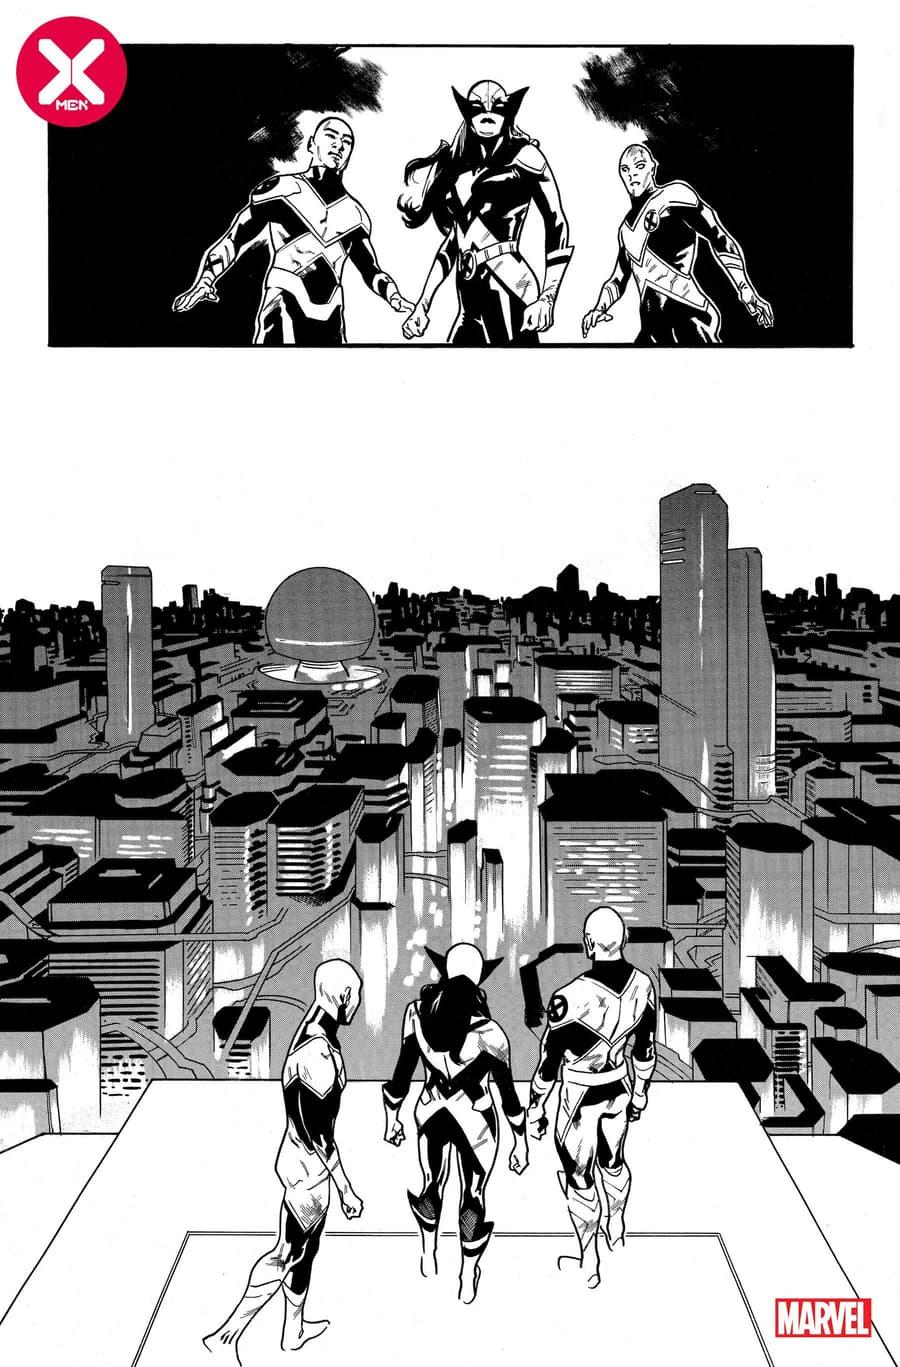 X-MEN #18 preview inks by Mahmud Asrar